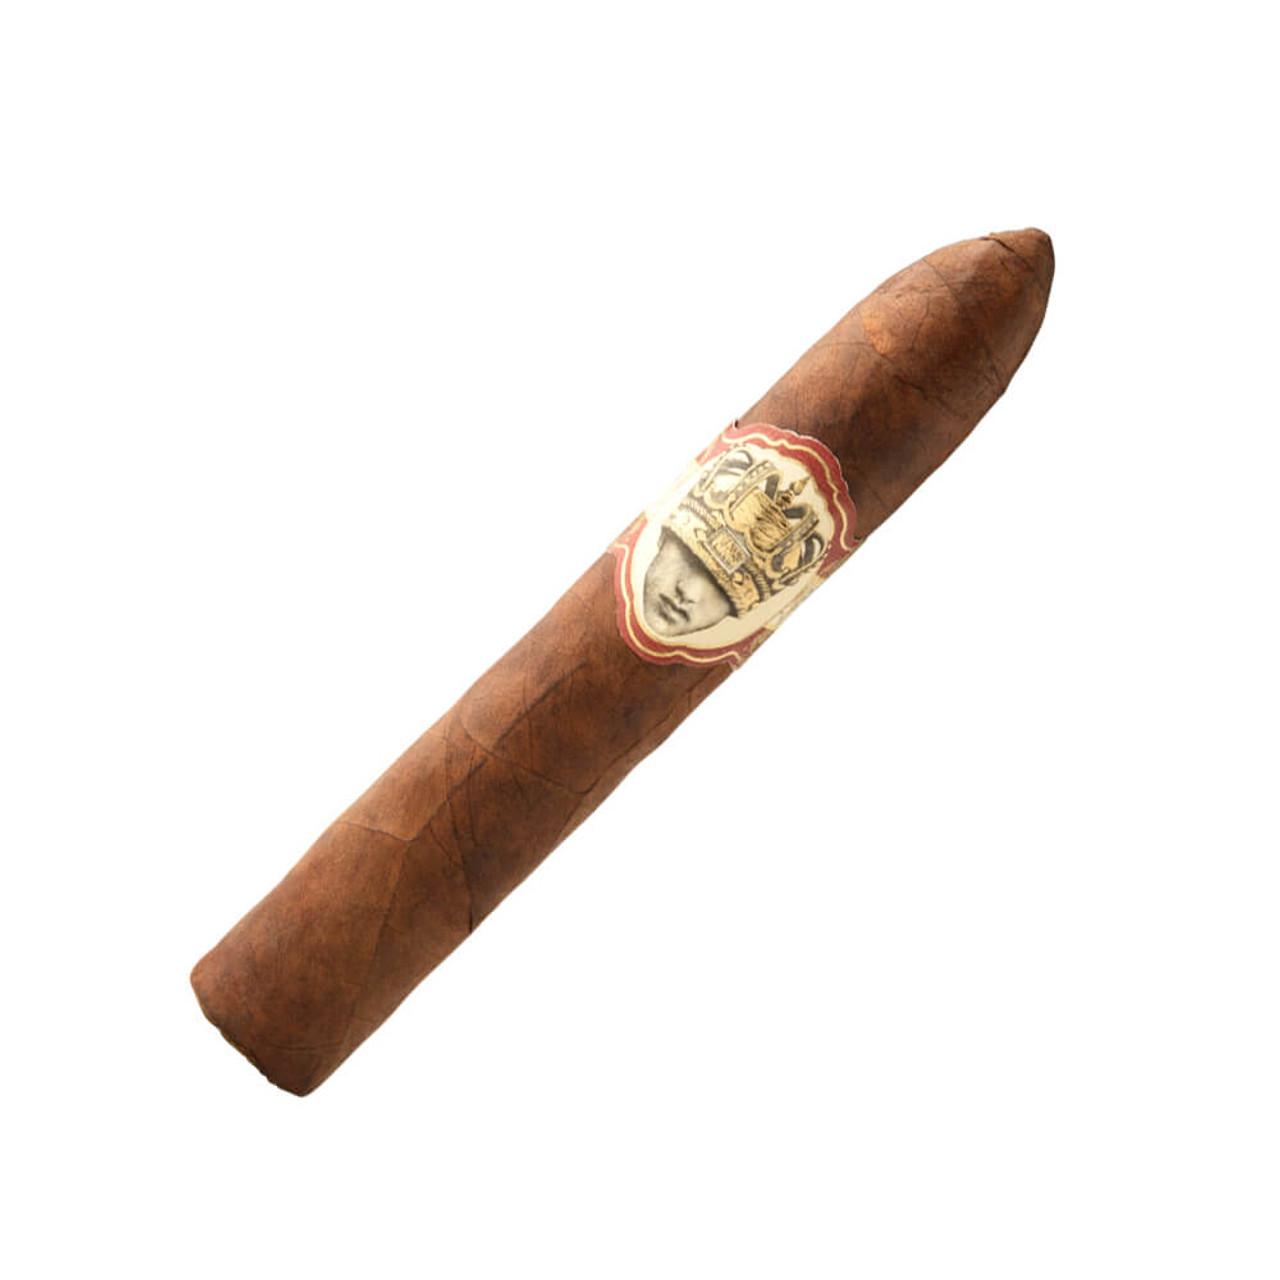 Caldwell Long Live The King Lock Stock Cigars - 5 x 52 (Box of 24)